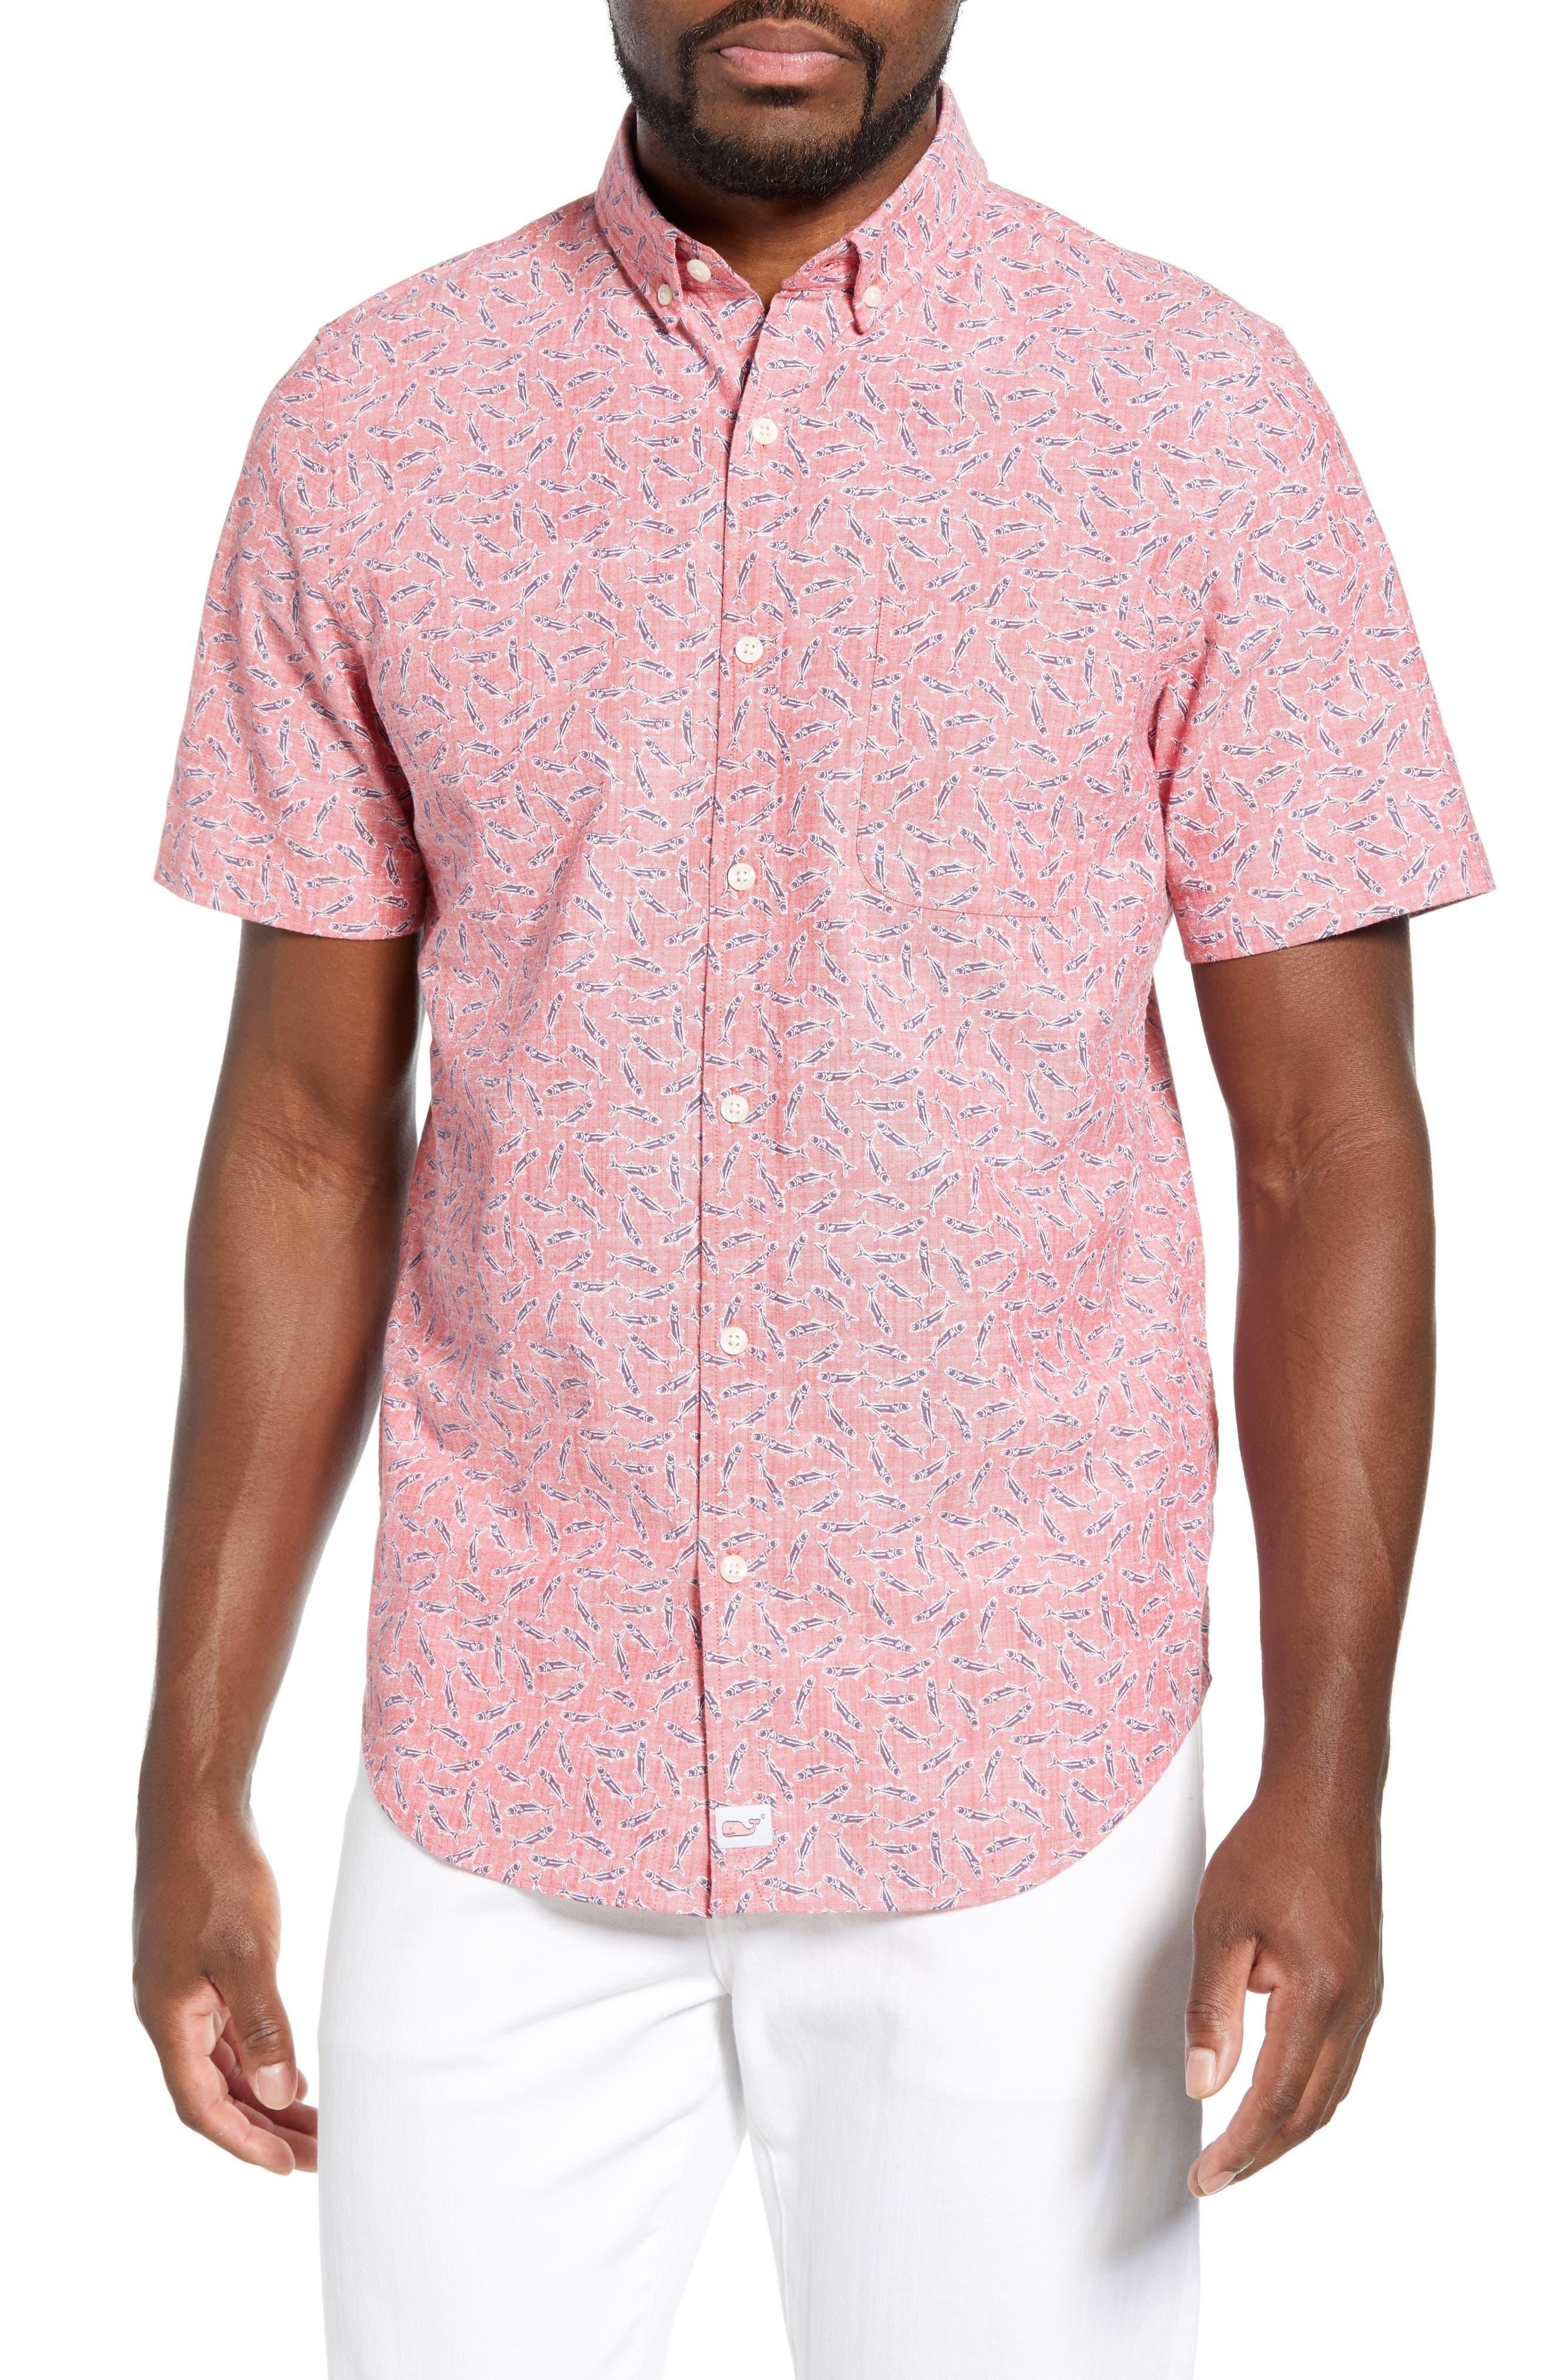 VINEYARD VINES,                             Murray Slim Fit Sport Shirt,                             Main thumbnail 1, color,                             LOBSTER REEF